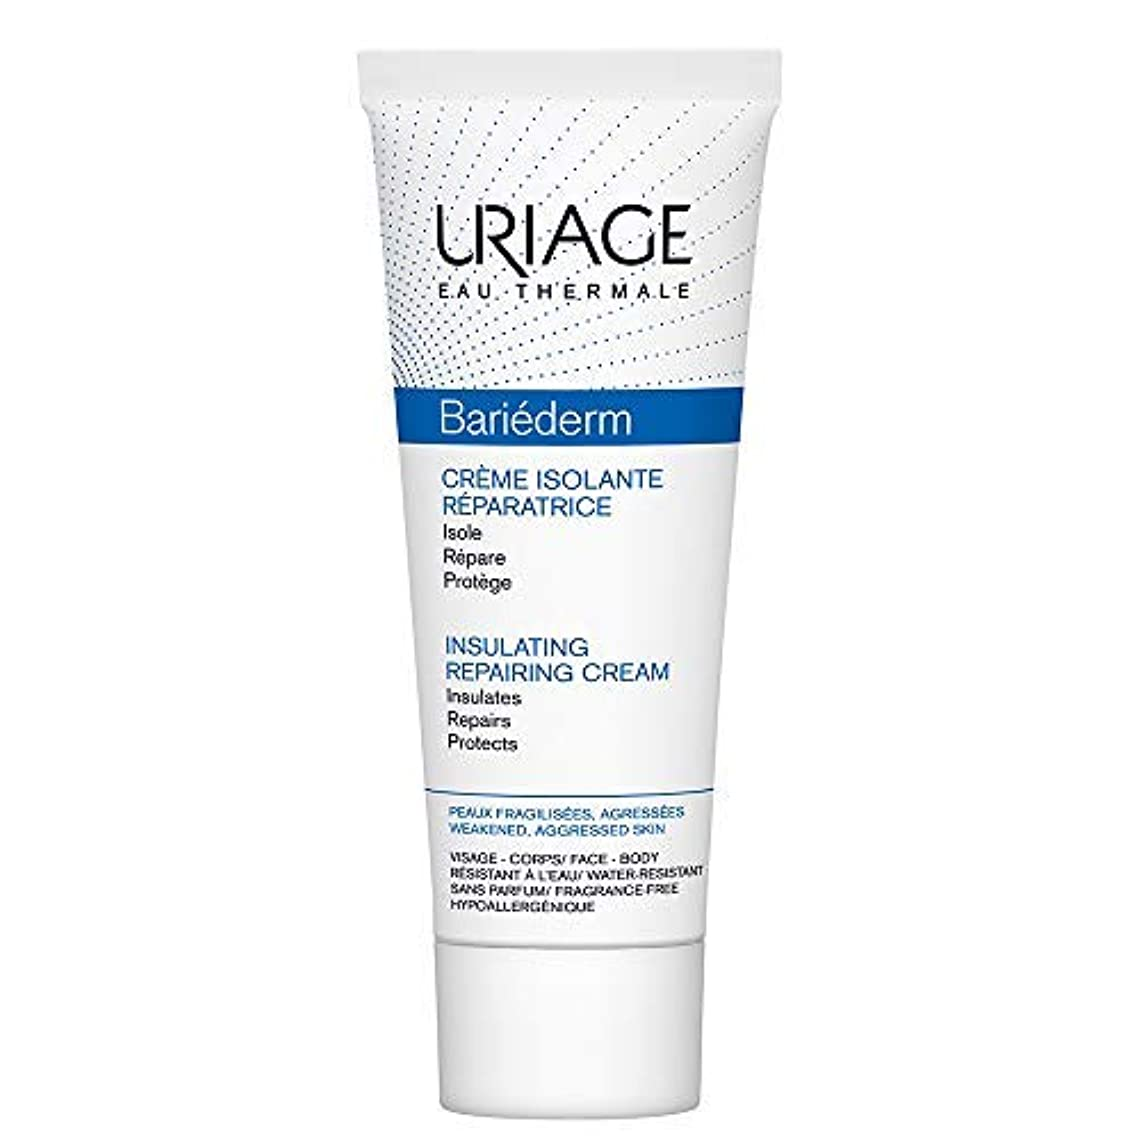 Uriage Bariederm Cream 75ml [並行輸入品]